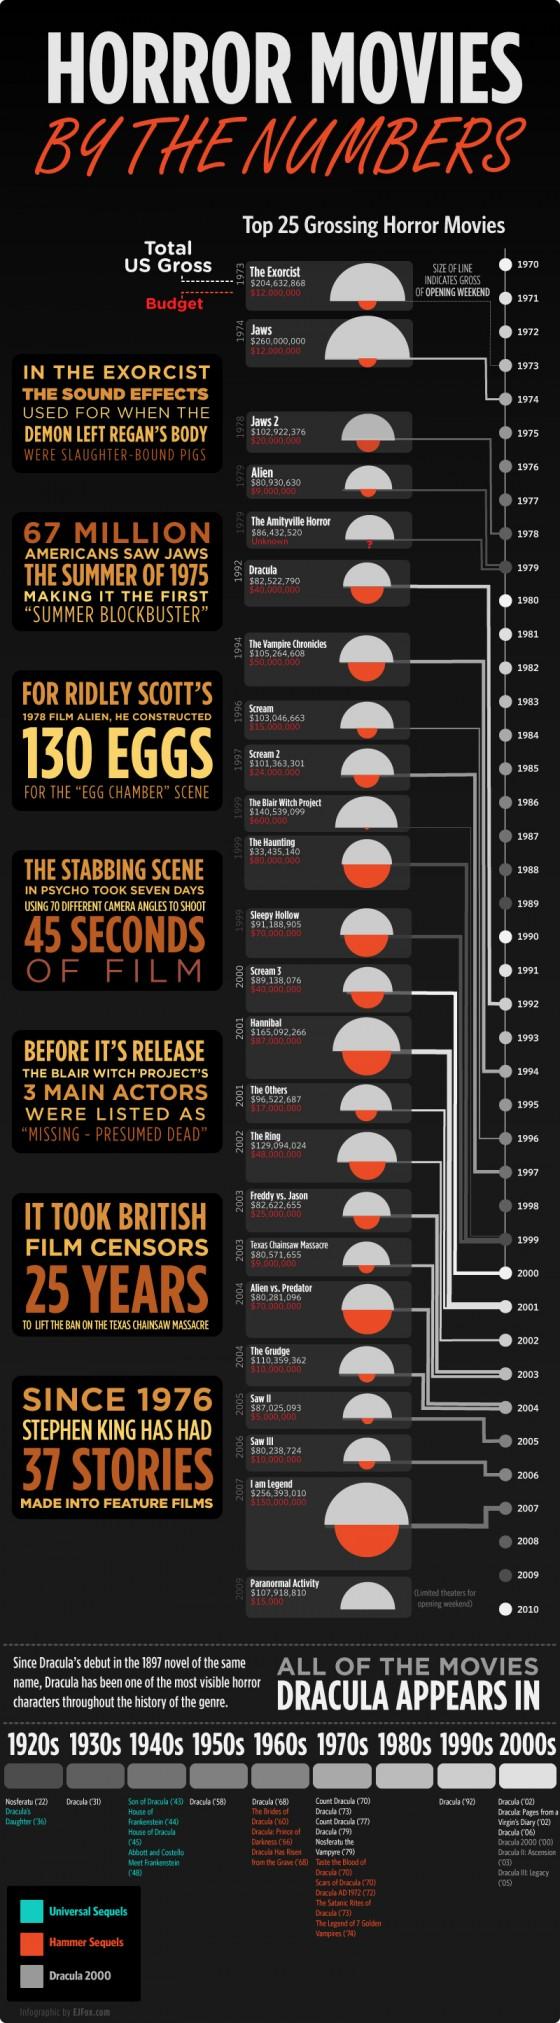 horrormovies infographic.r1 560x2023